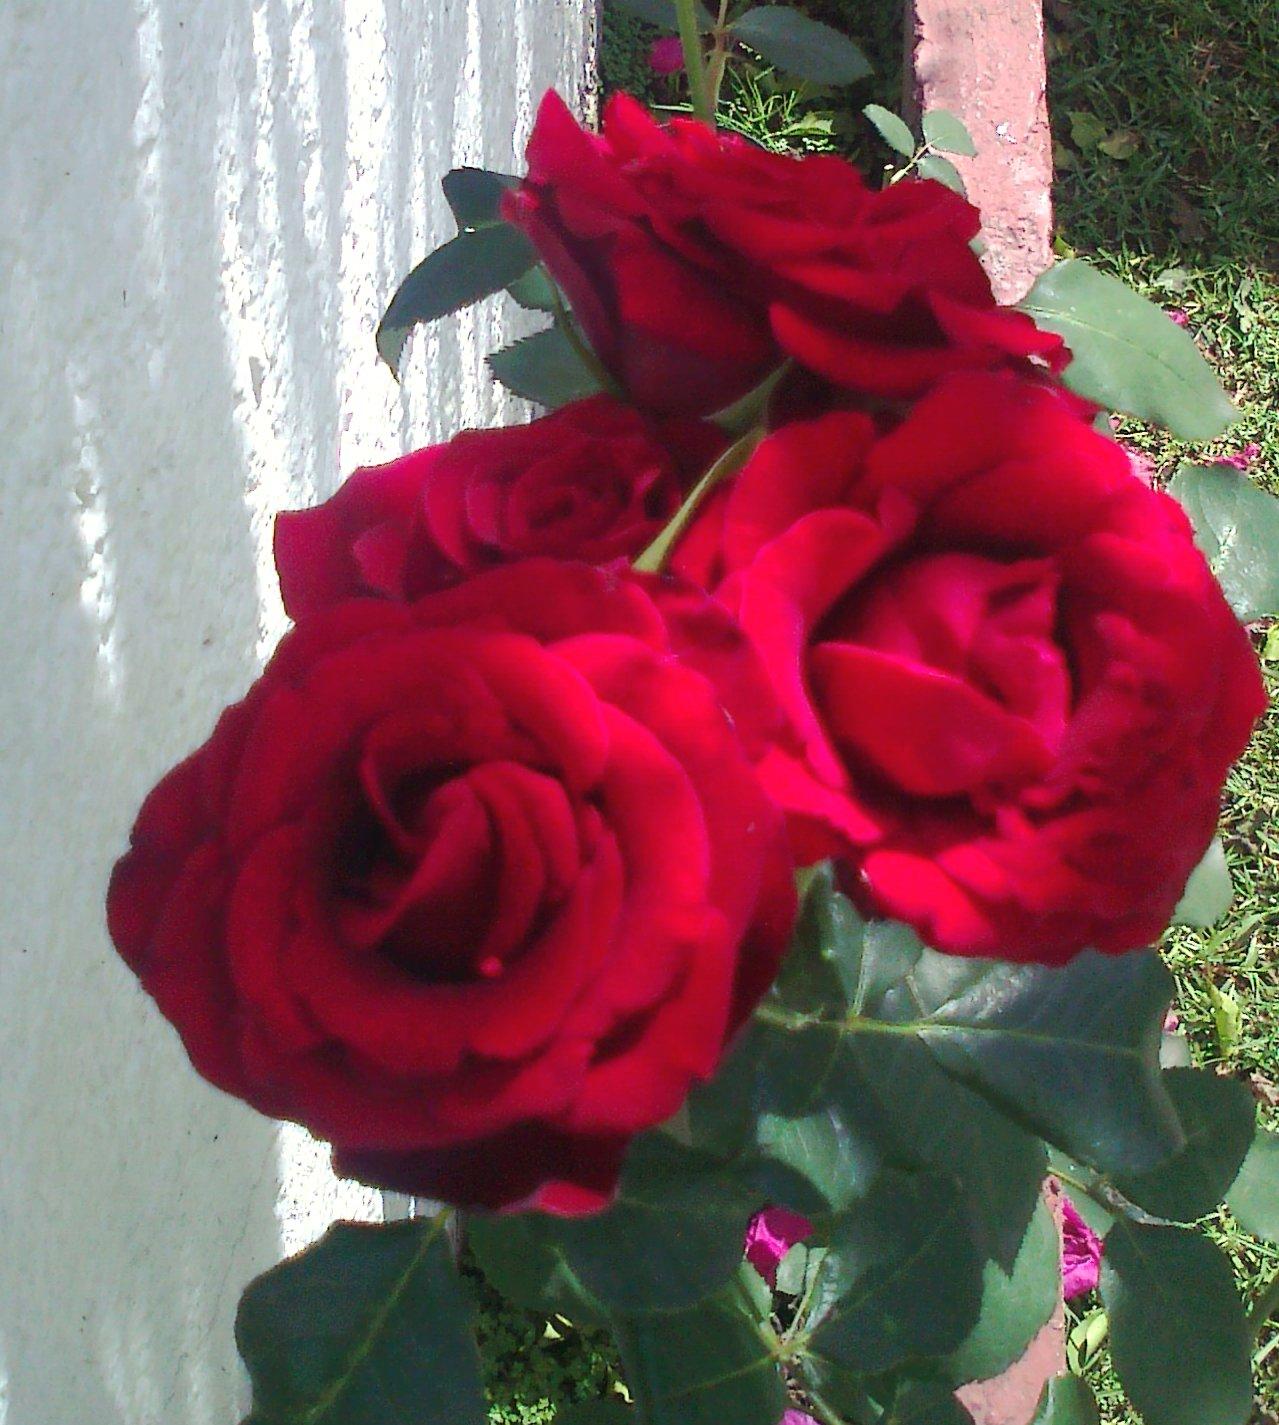 Description Ramillete de rosas rojas.jpg